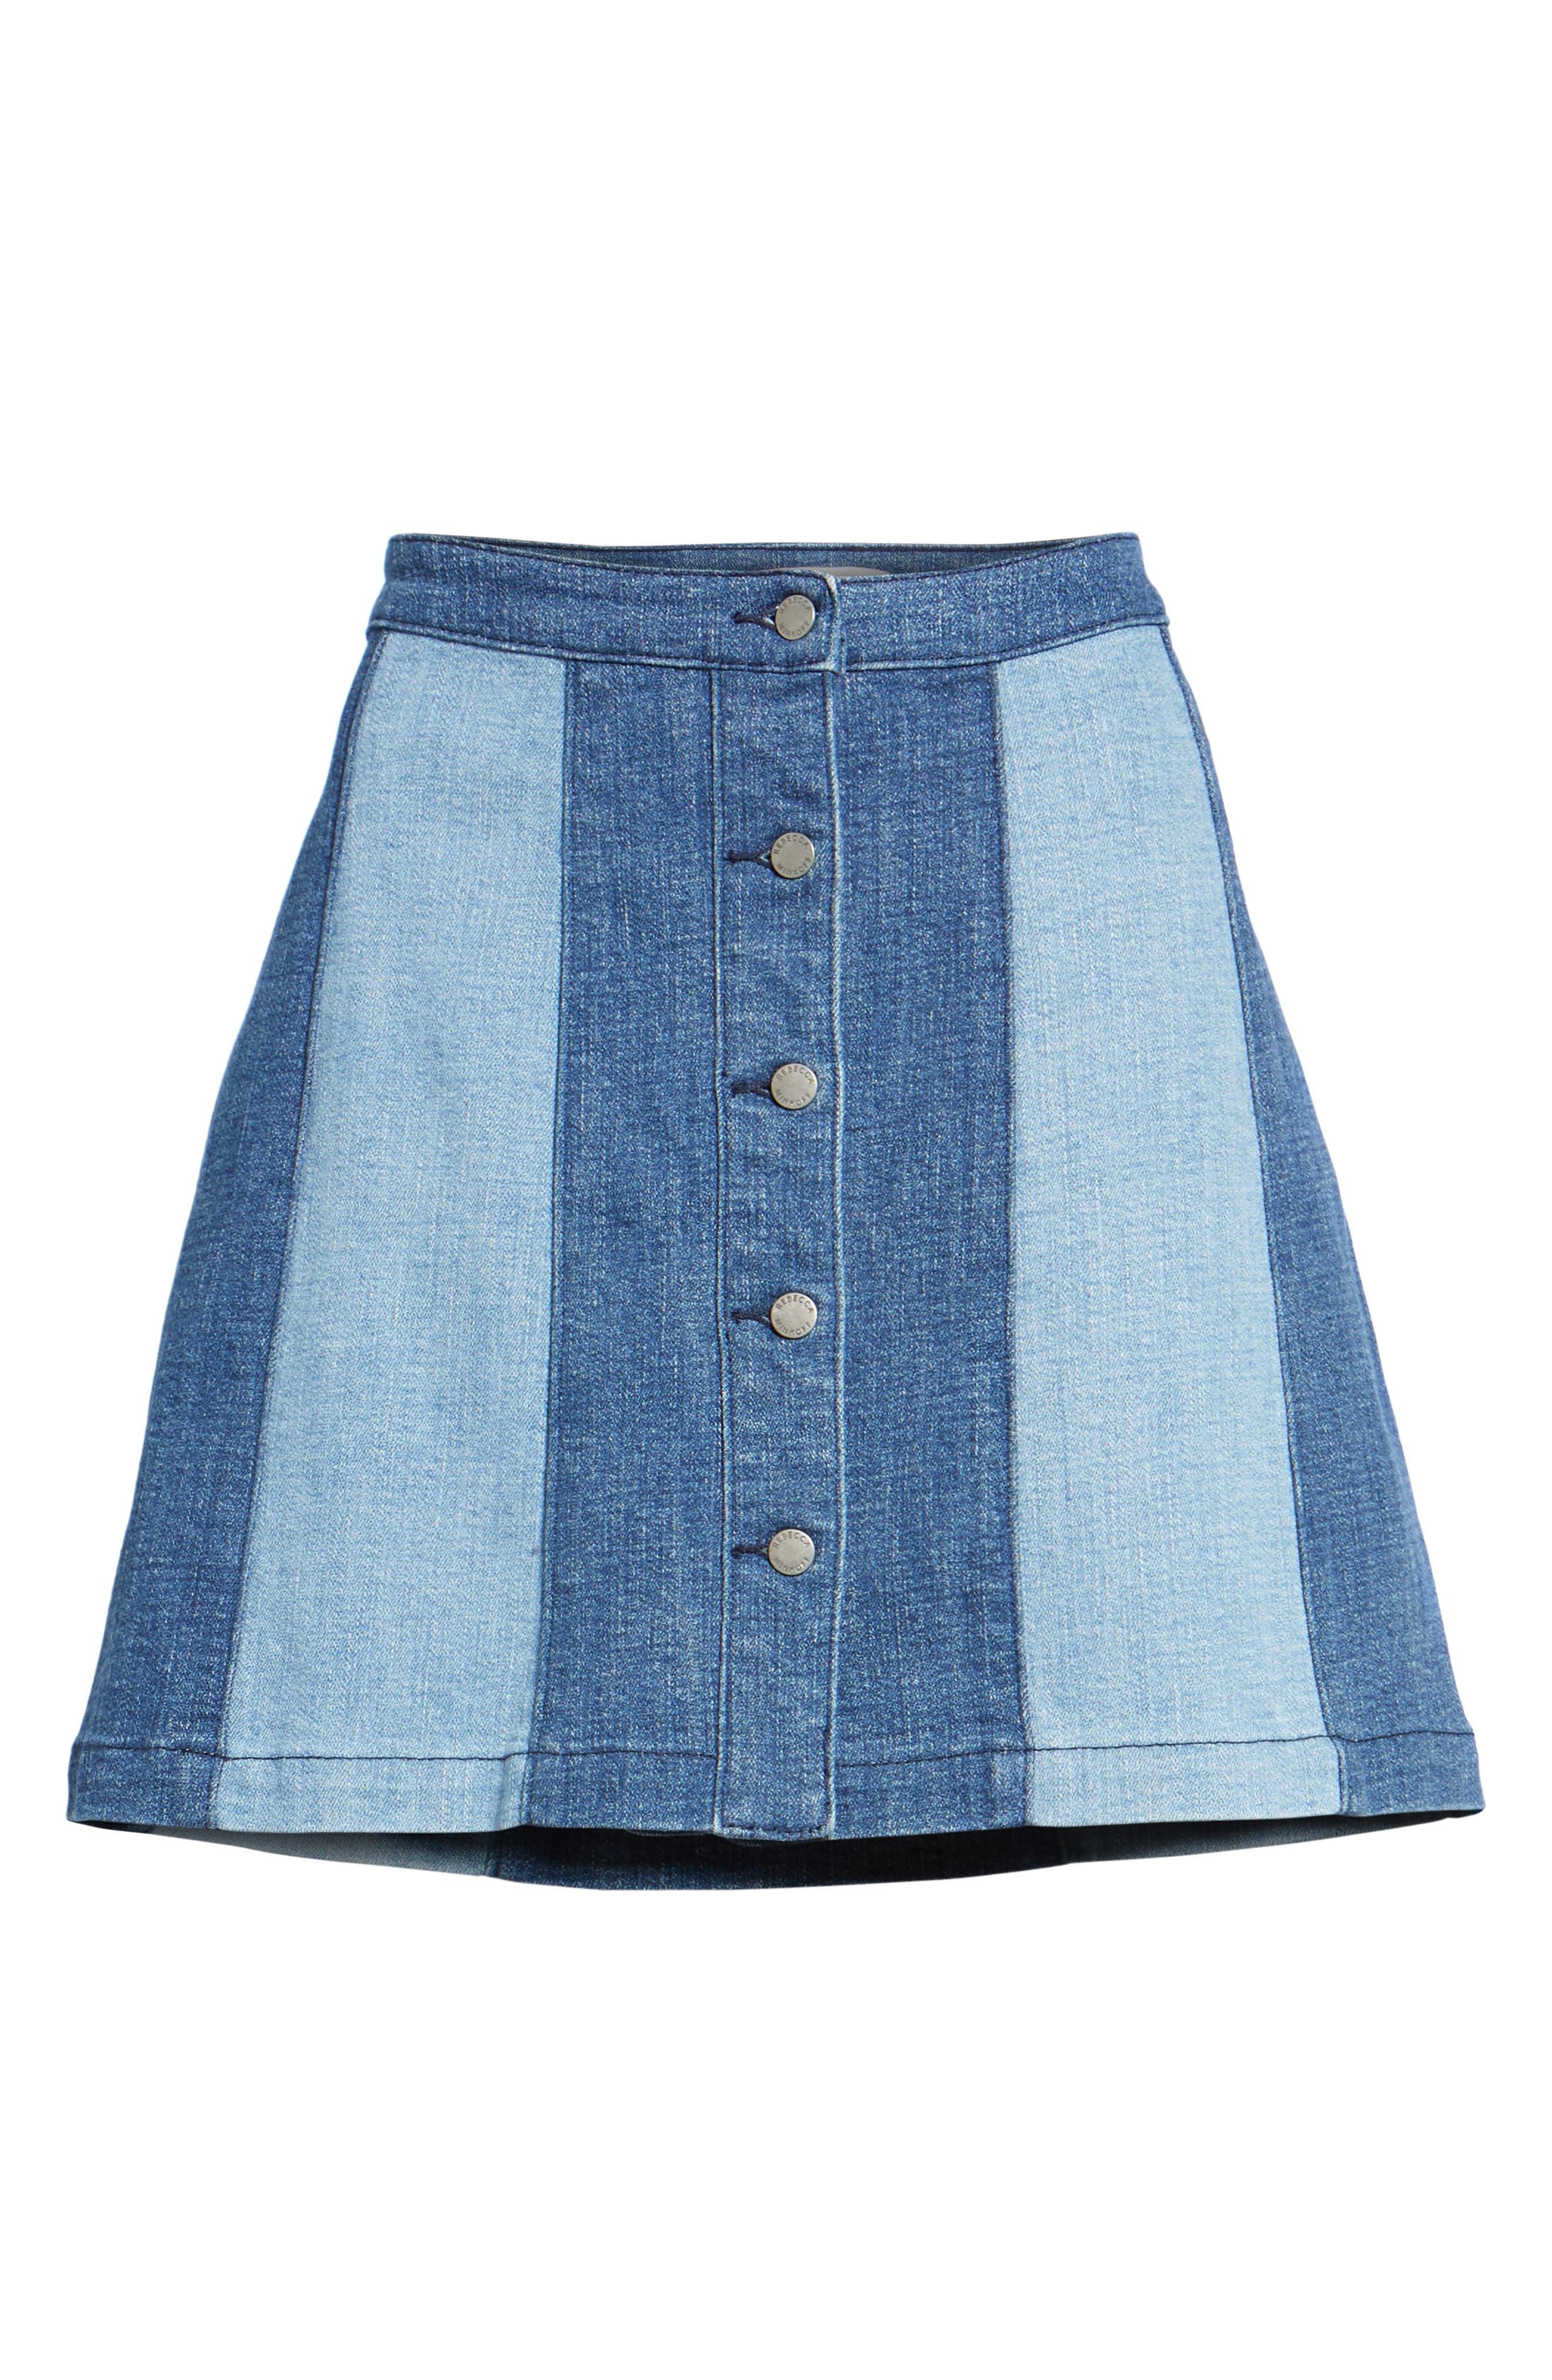 Beatty Denim Miniskirt,                             Alternate thumbnail 6, color,                             Indigo